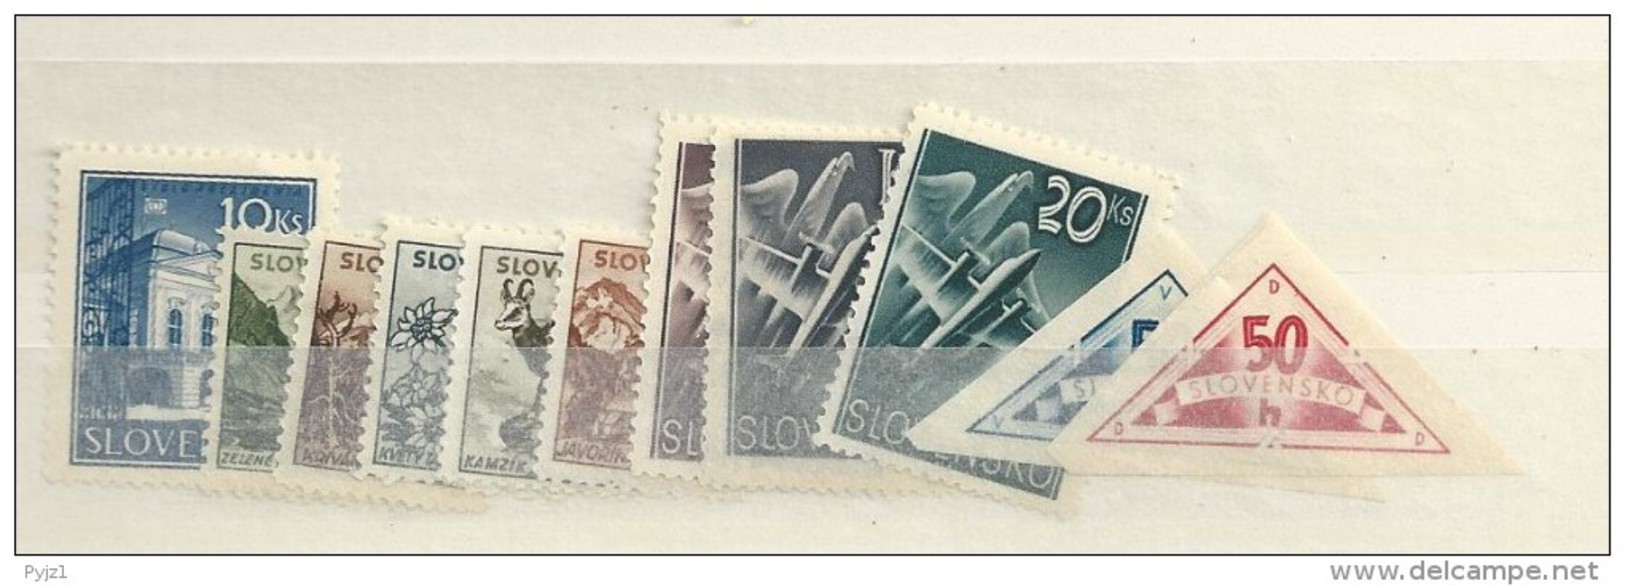 1940 MH Year Collection Slowakei, Slovensko - Unused Stamps